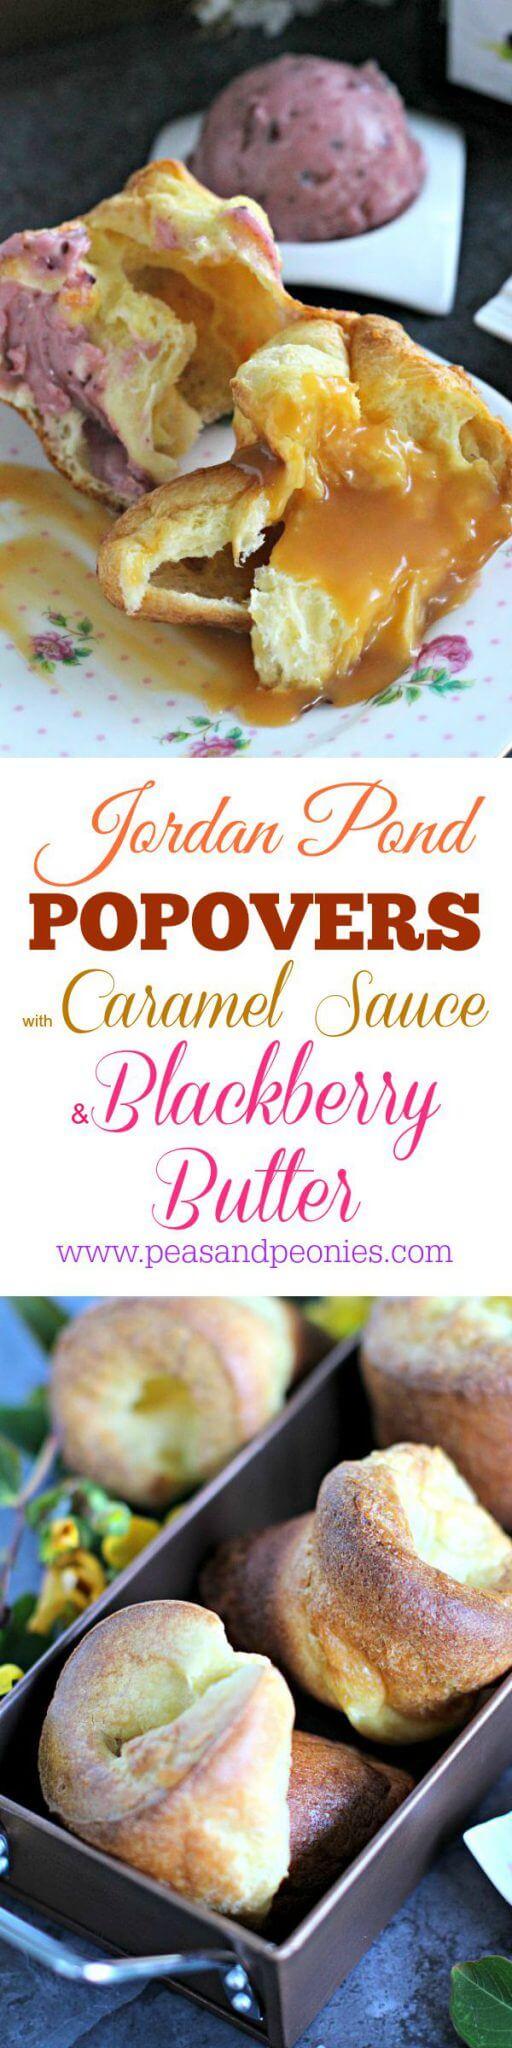 JORDAN POND POPOVERS RECIPE PIN